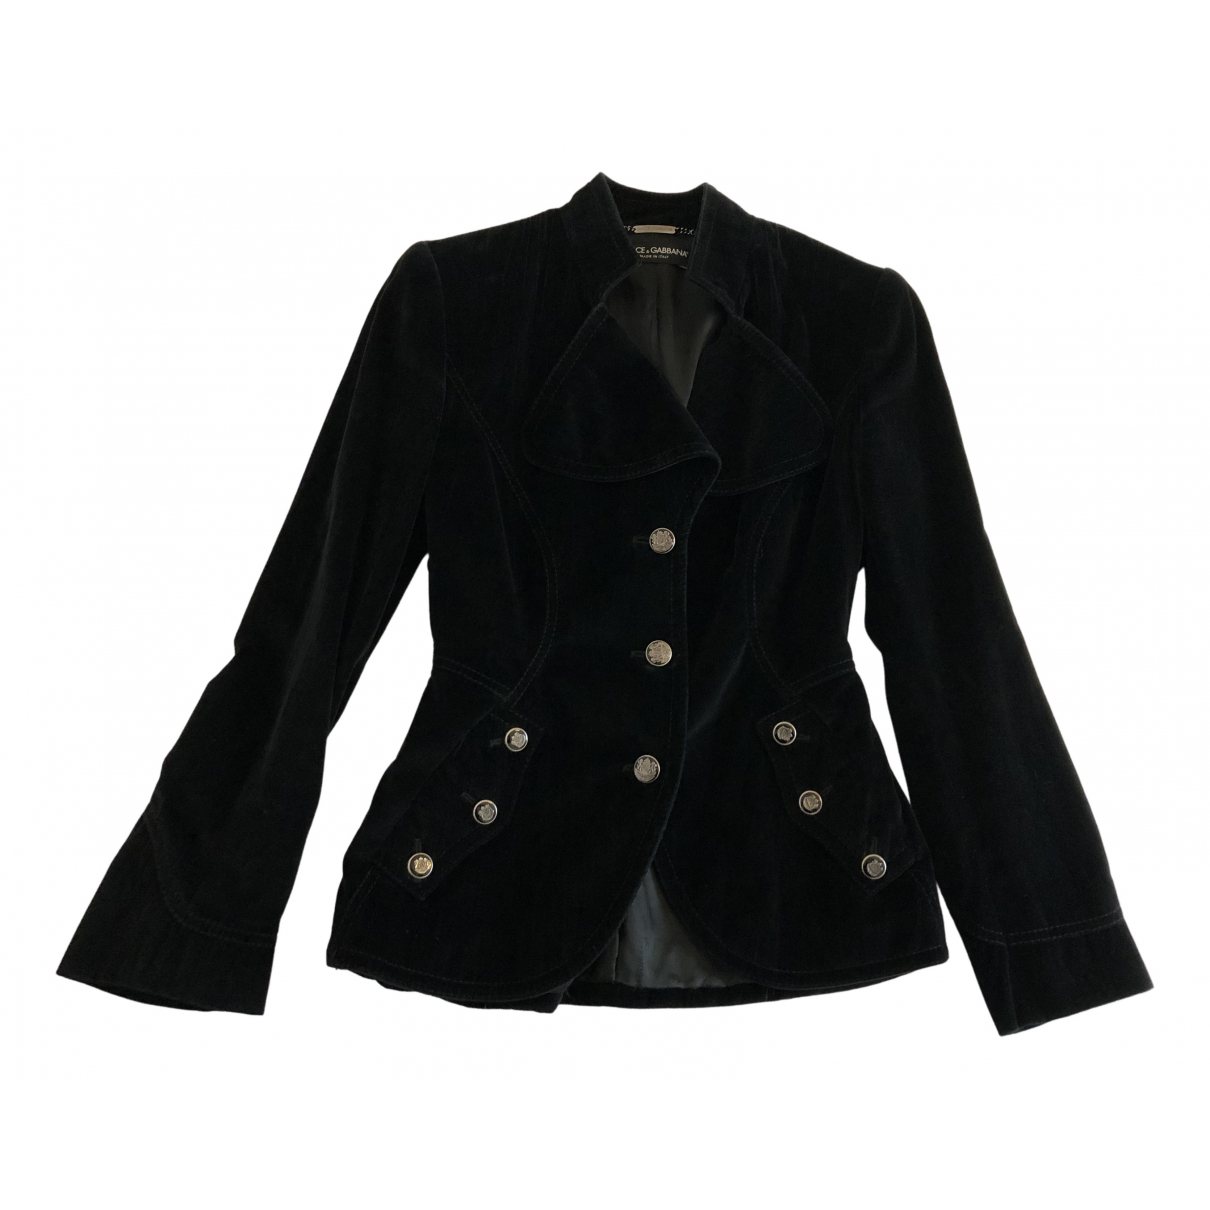 Dolce & Gabbana \N Jacke in  Schwarz Samt